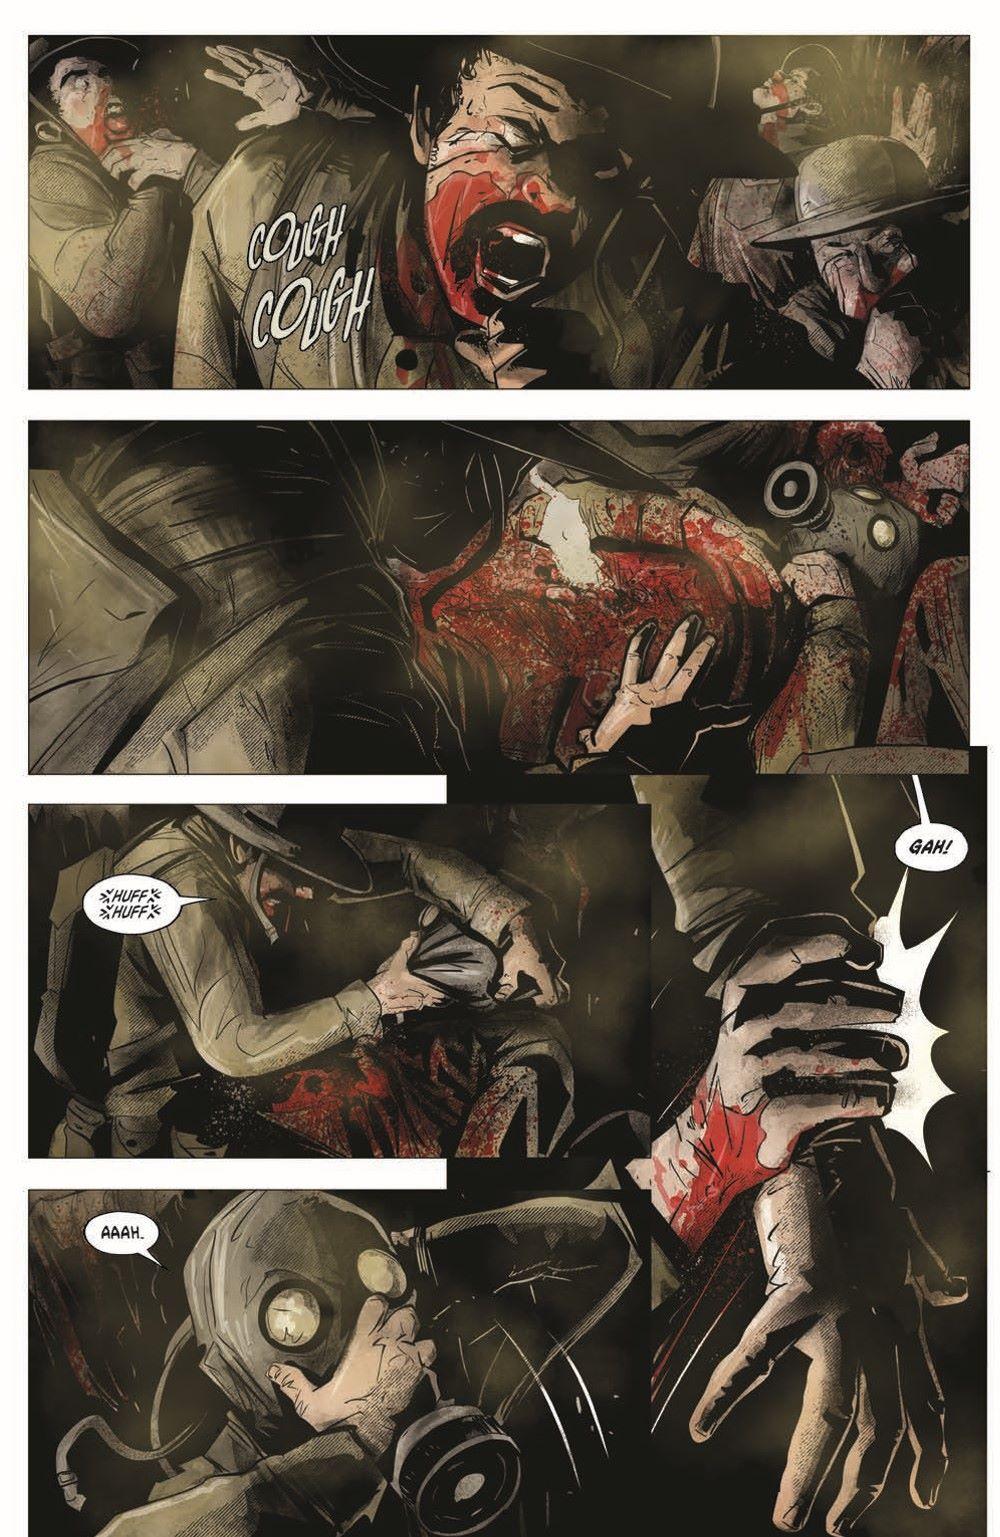 SeaOfSorrow05_pr-3 ComicList Previews: SEA OF SORROWS #5 (OF 5)